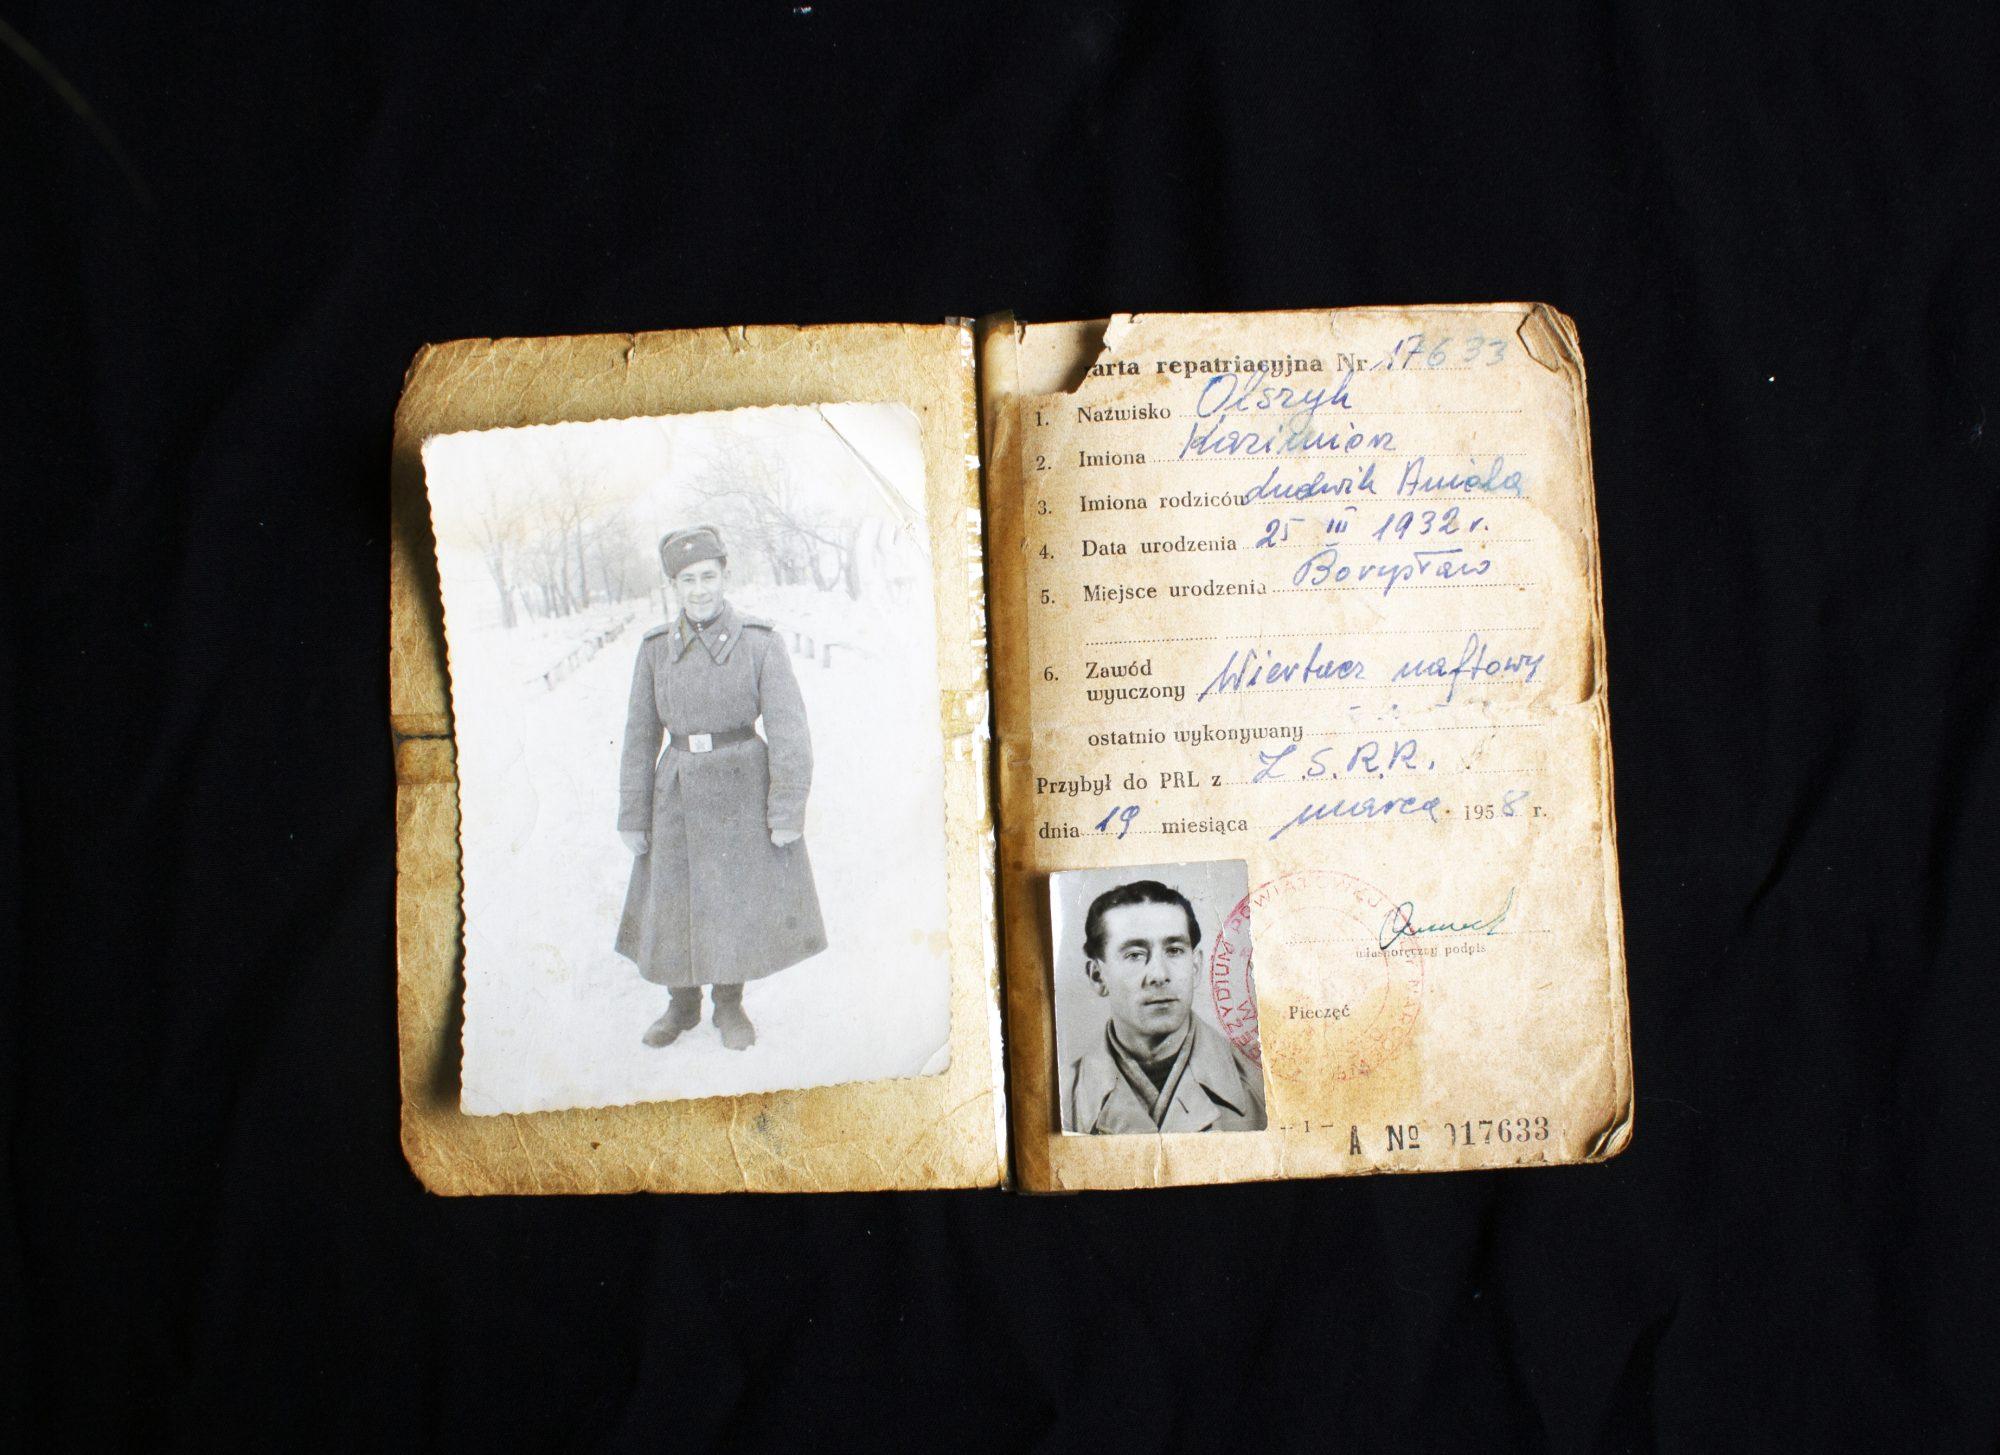 Alicja Kaciun's great-grandfather's passport